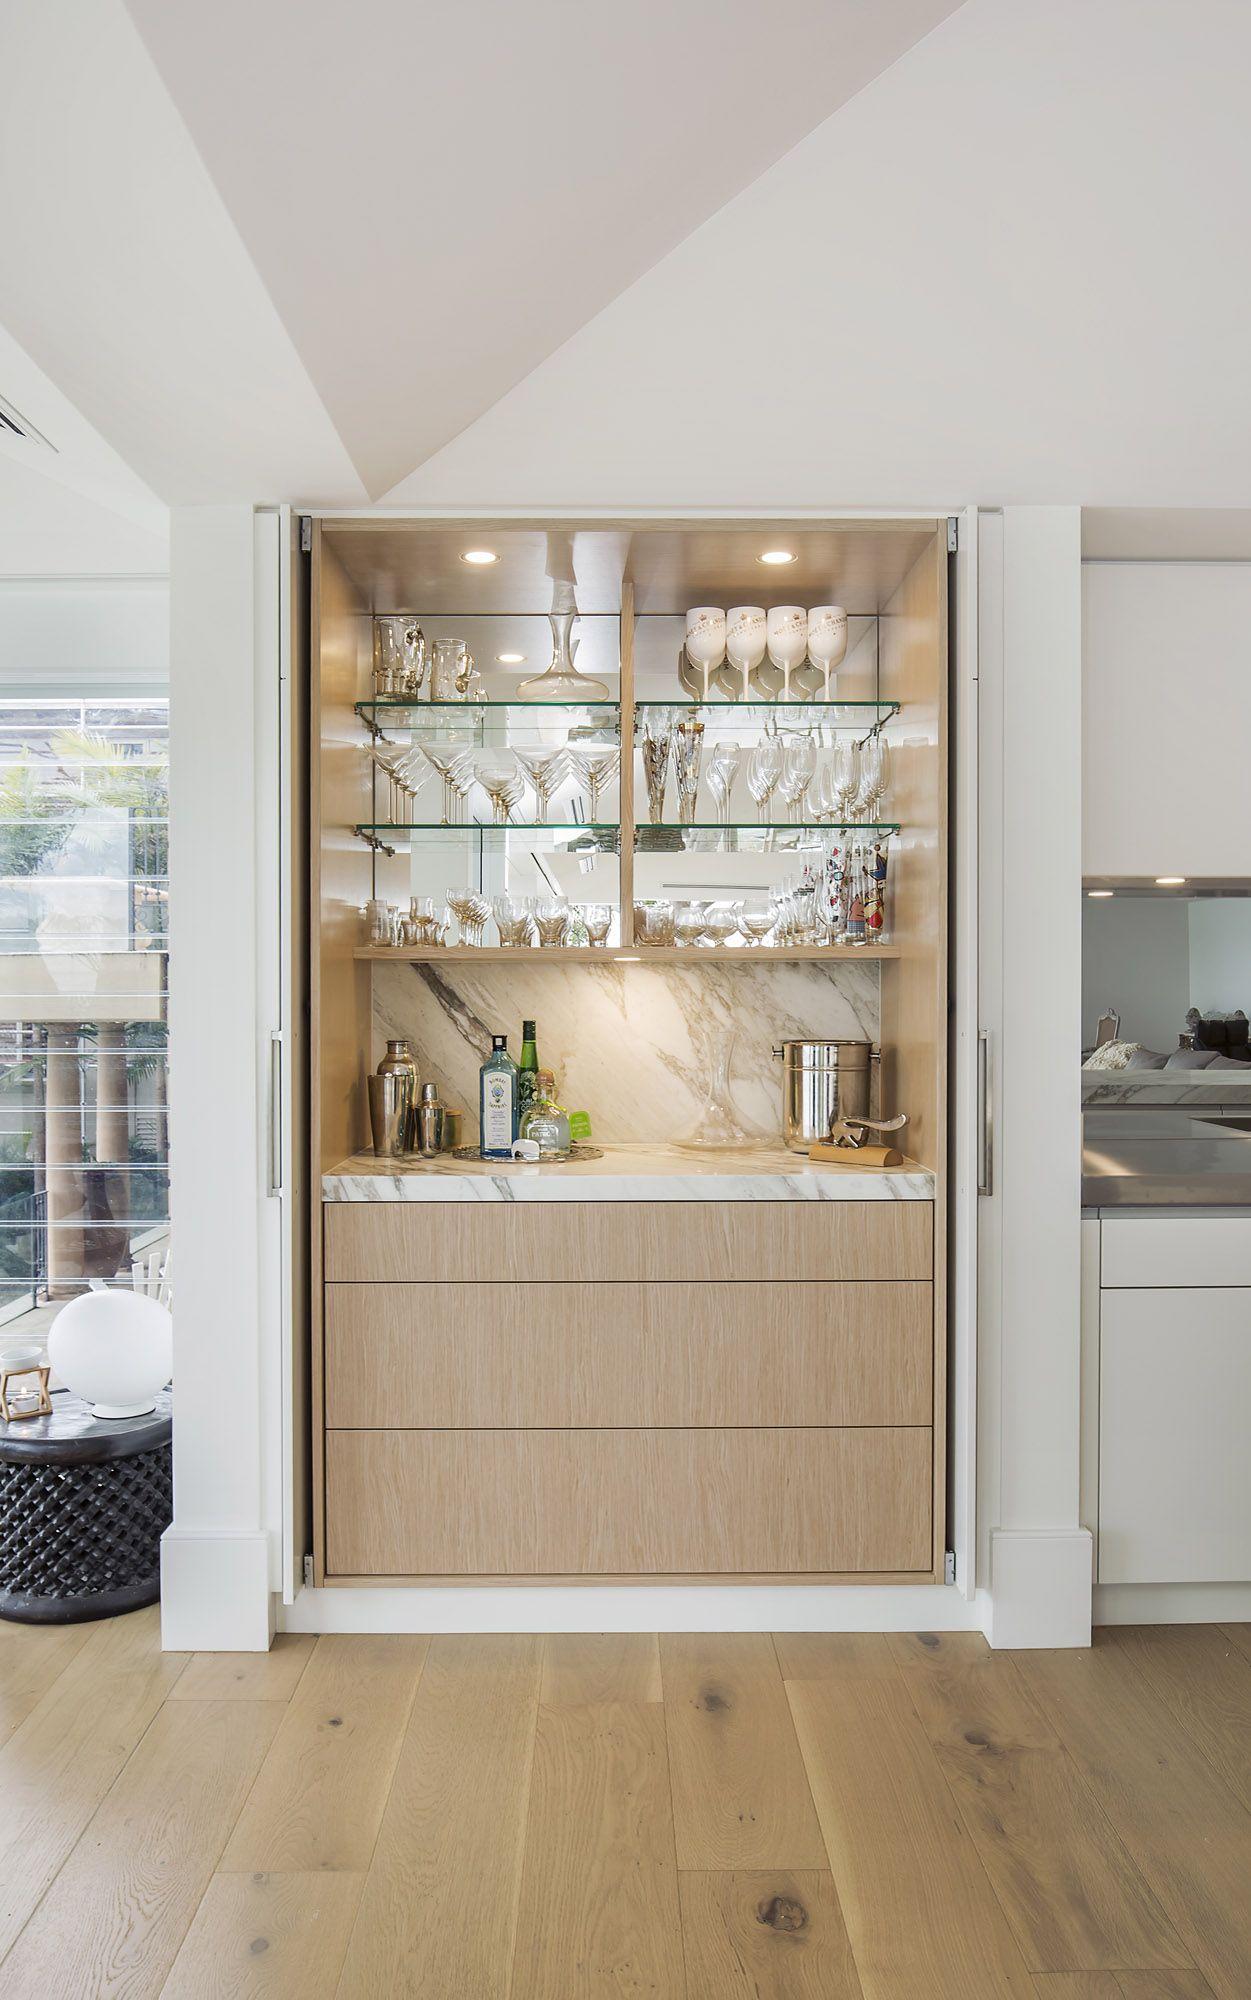 Hidden Drinks Bar Luxury Entertainers Kitchen With Striking Calacatta Marble Island Modern Home Bar Kitchen Bar Design Bars For Home